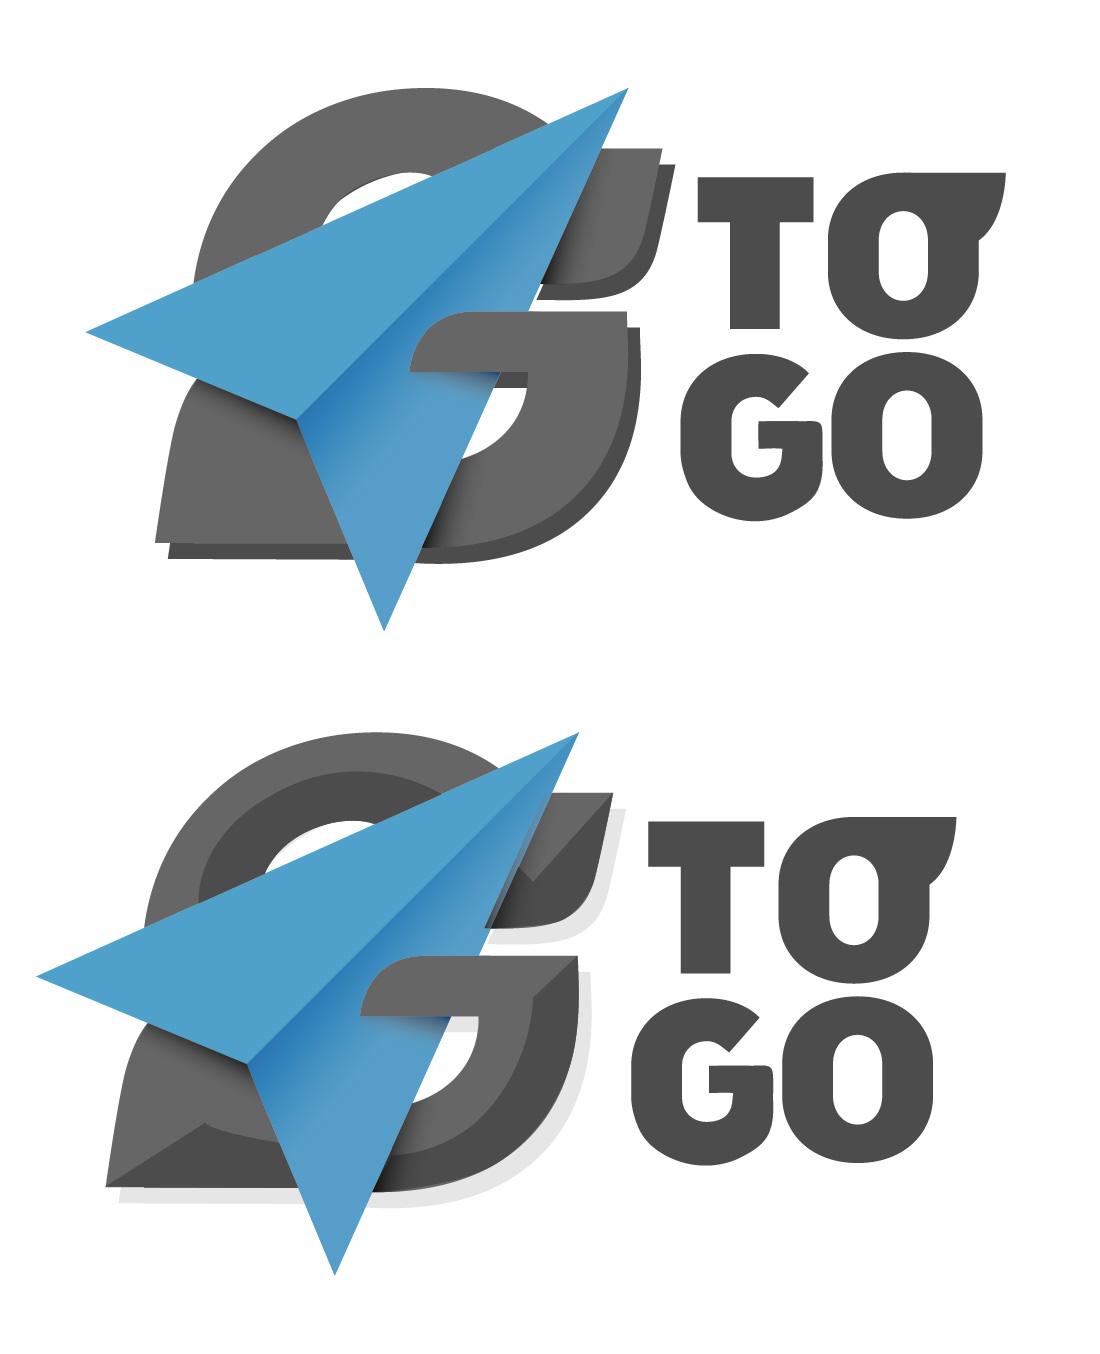 Разработать логотип и экран загрузки приложения фото f_2015a817631322fe.jpg